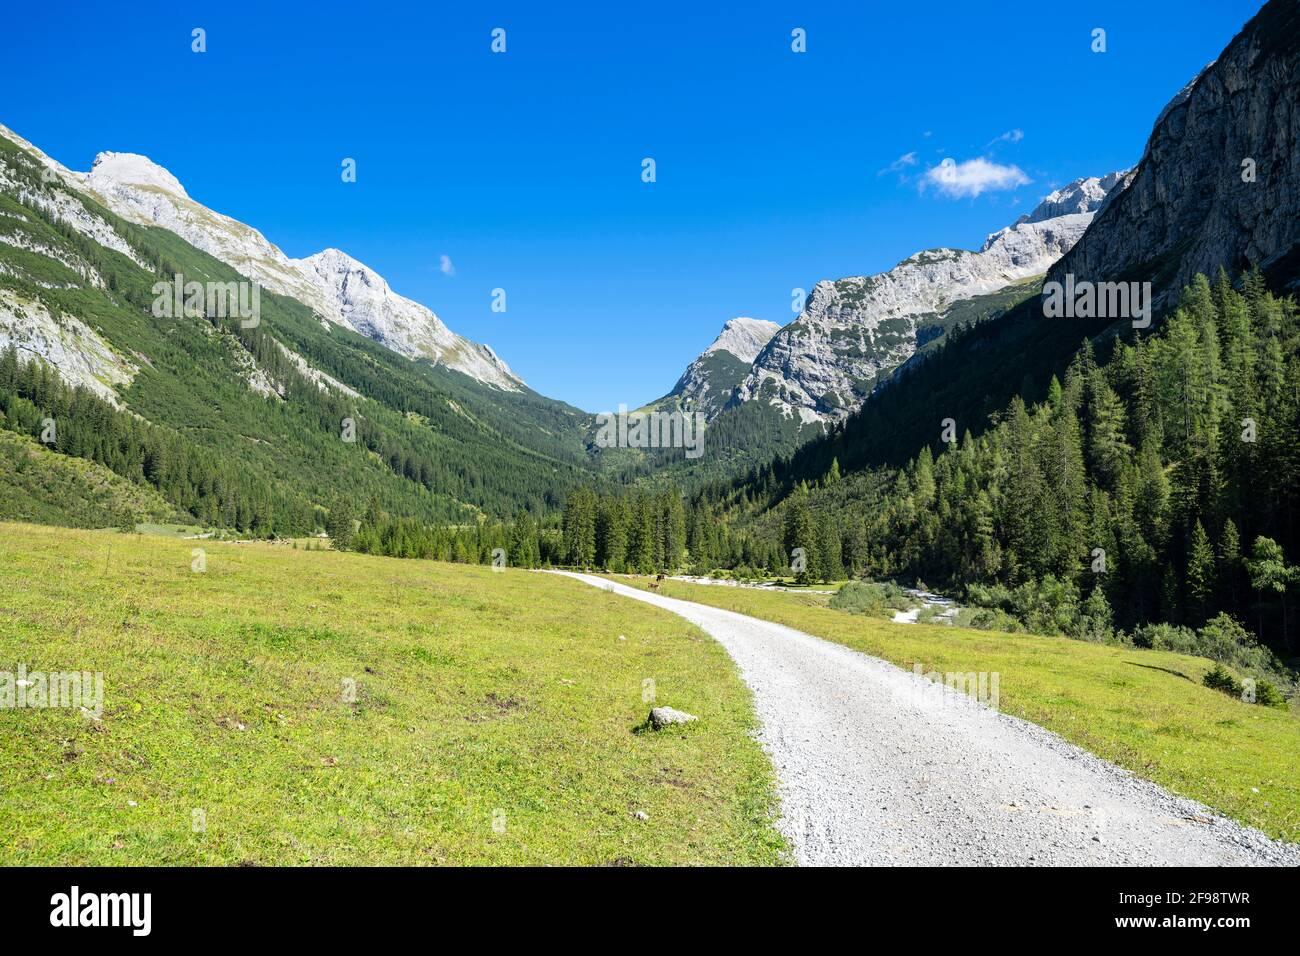 Alpine mountain landscape in the Karwendel valley on a sunny summer day. Karwendel, Tyrol, Austria Stock Photo